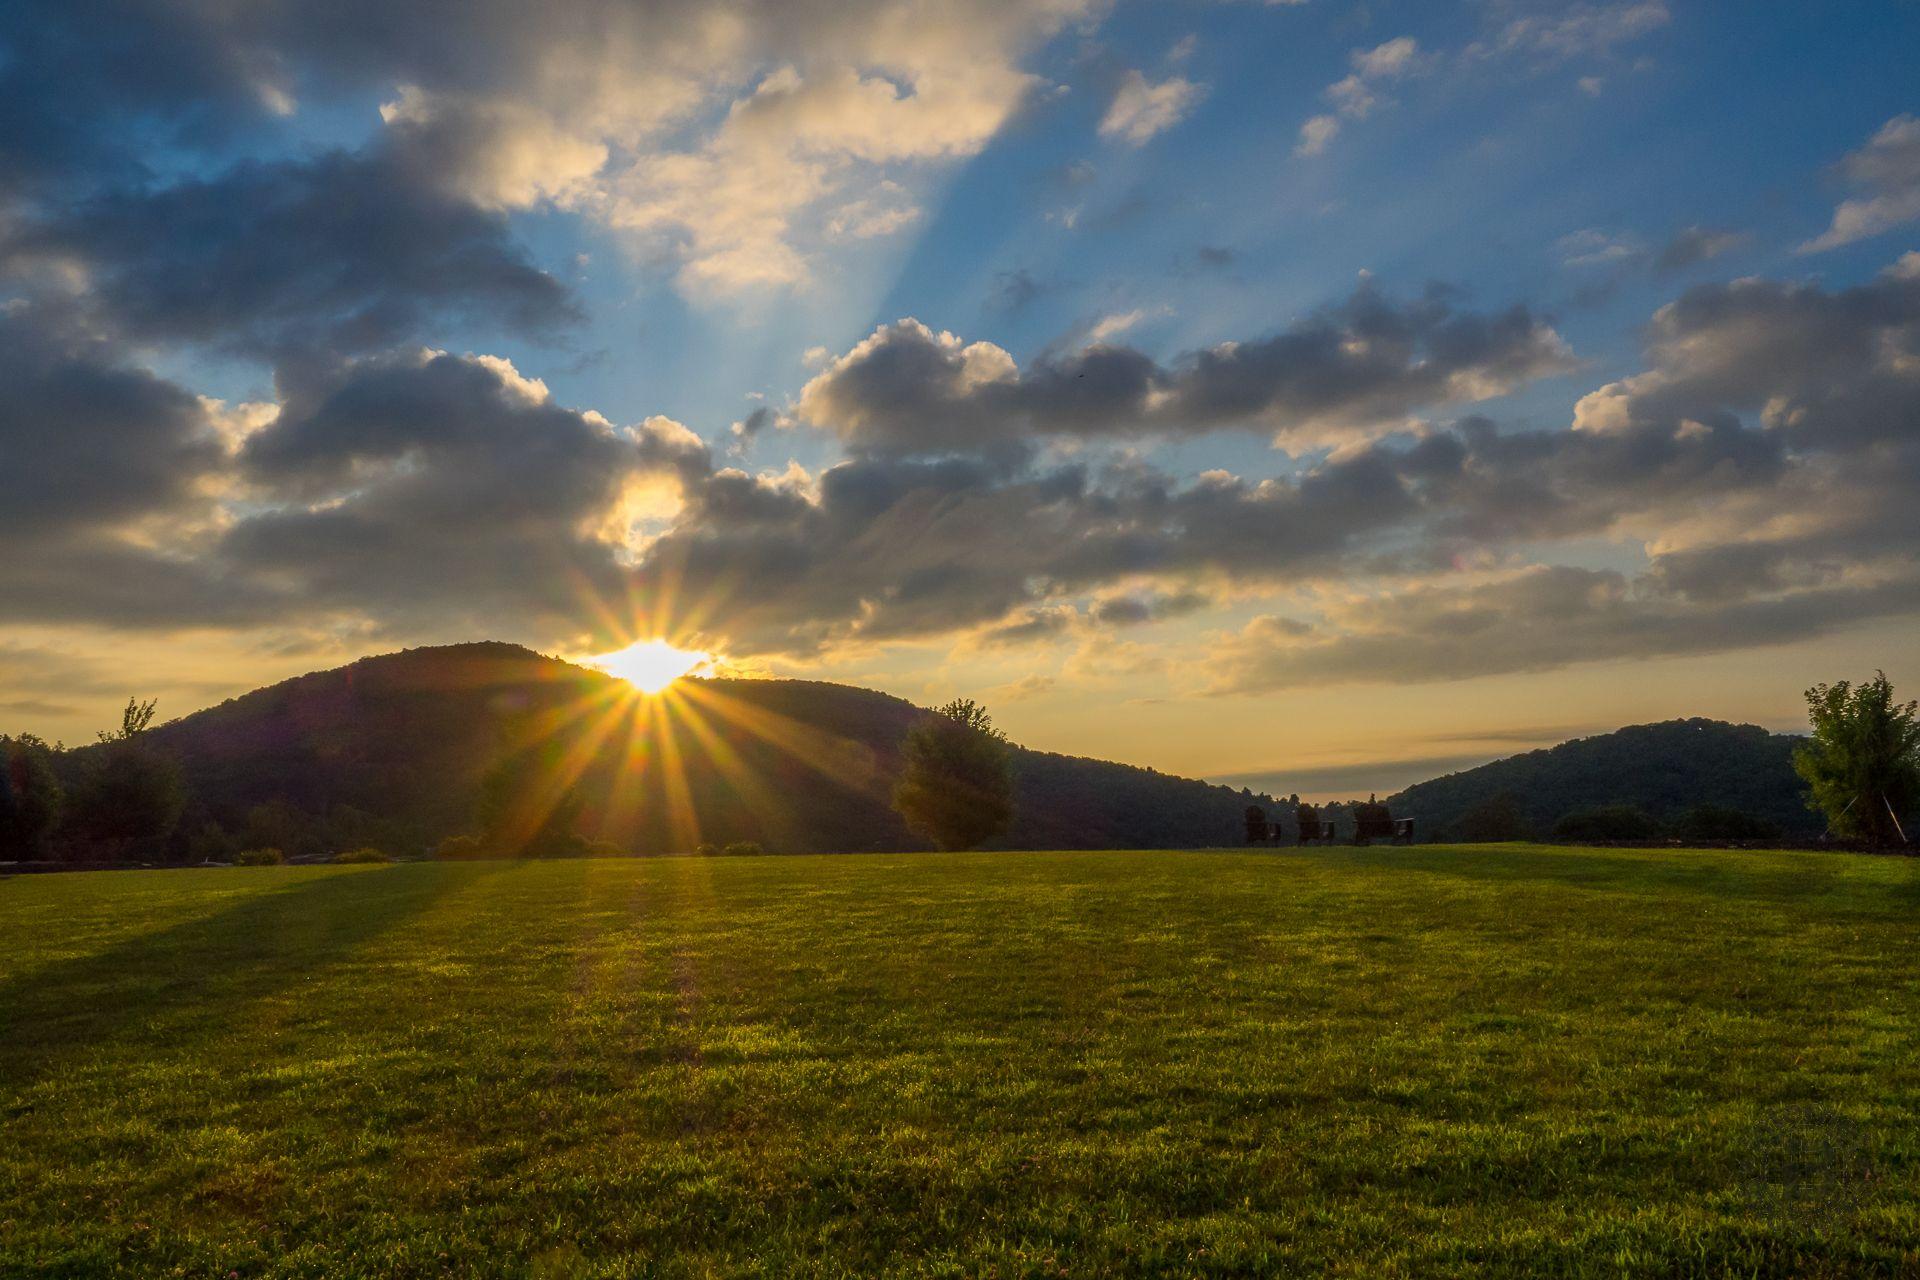 Meanderthals | Grand Highlands at Bearwallow Mountain – A Photo Essay